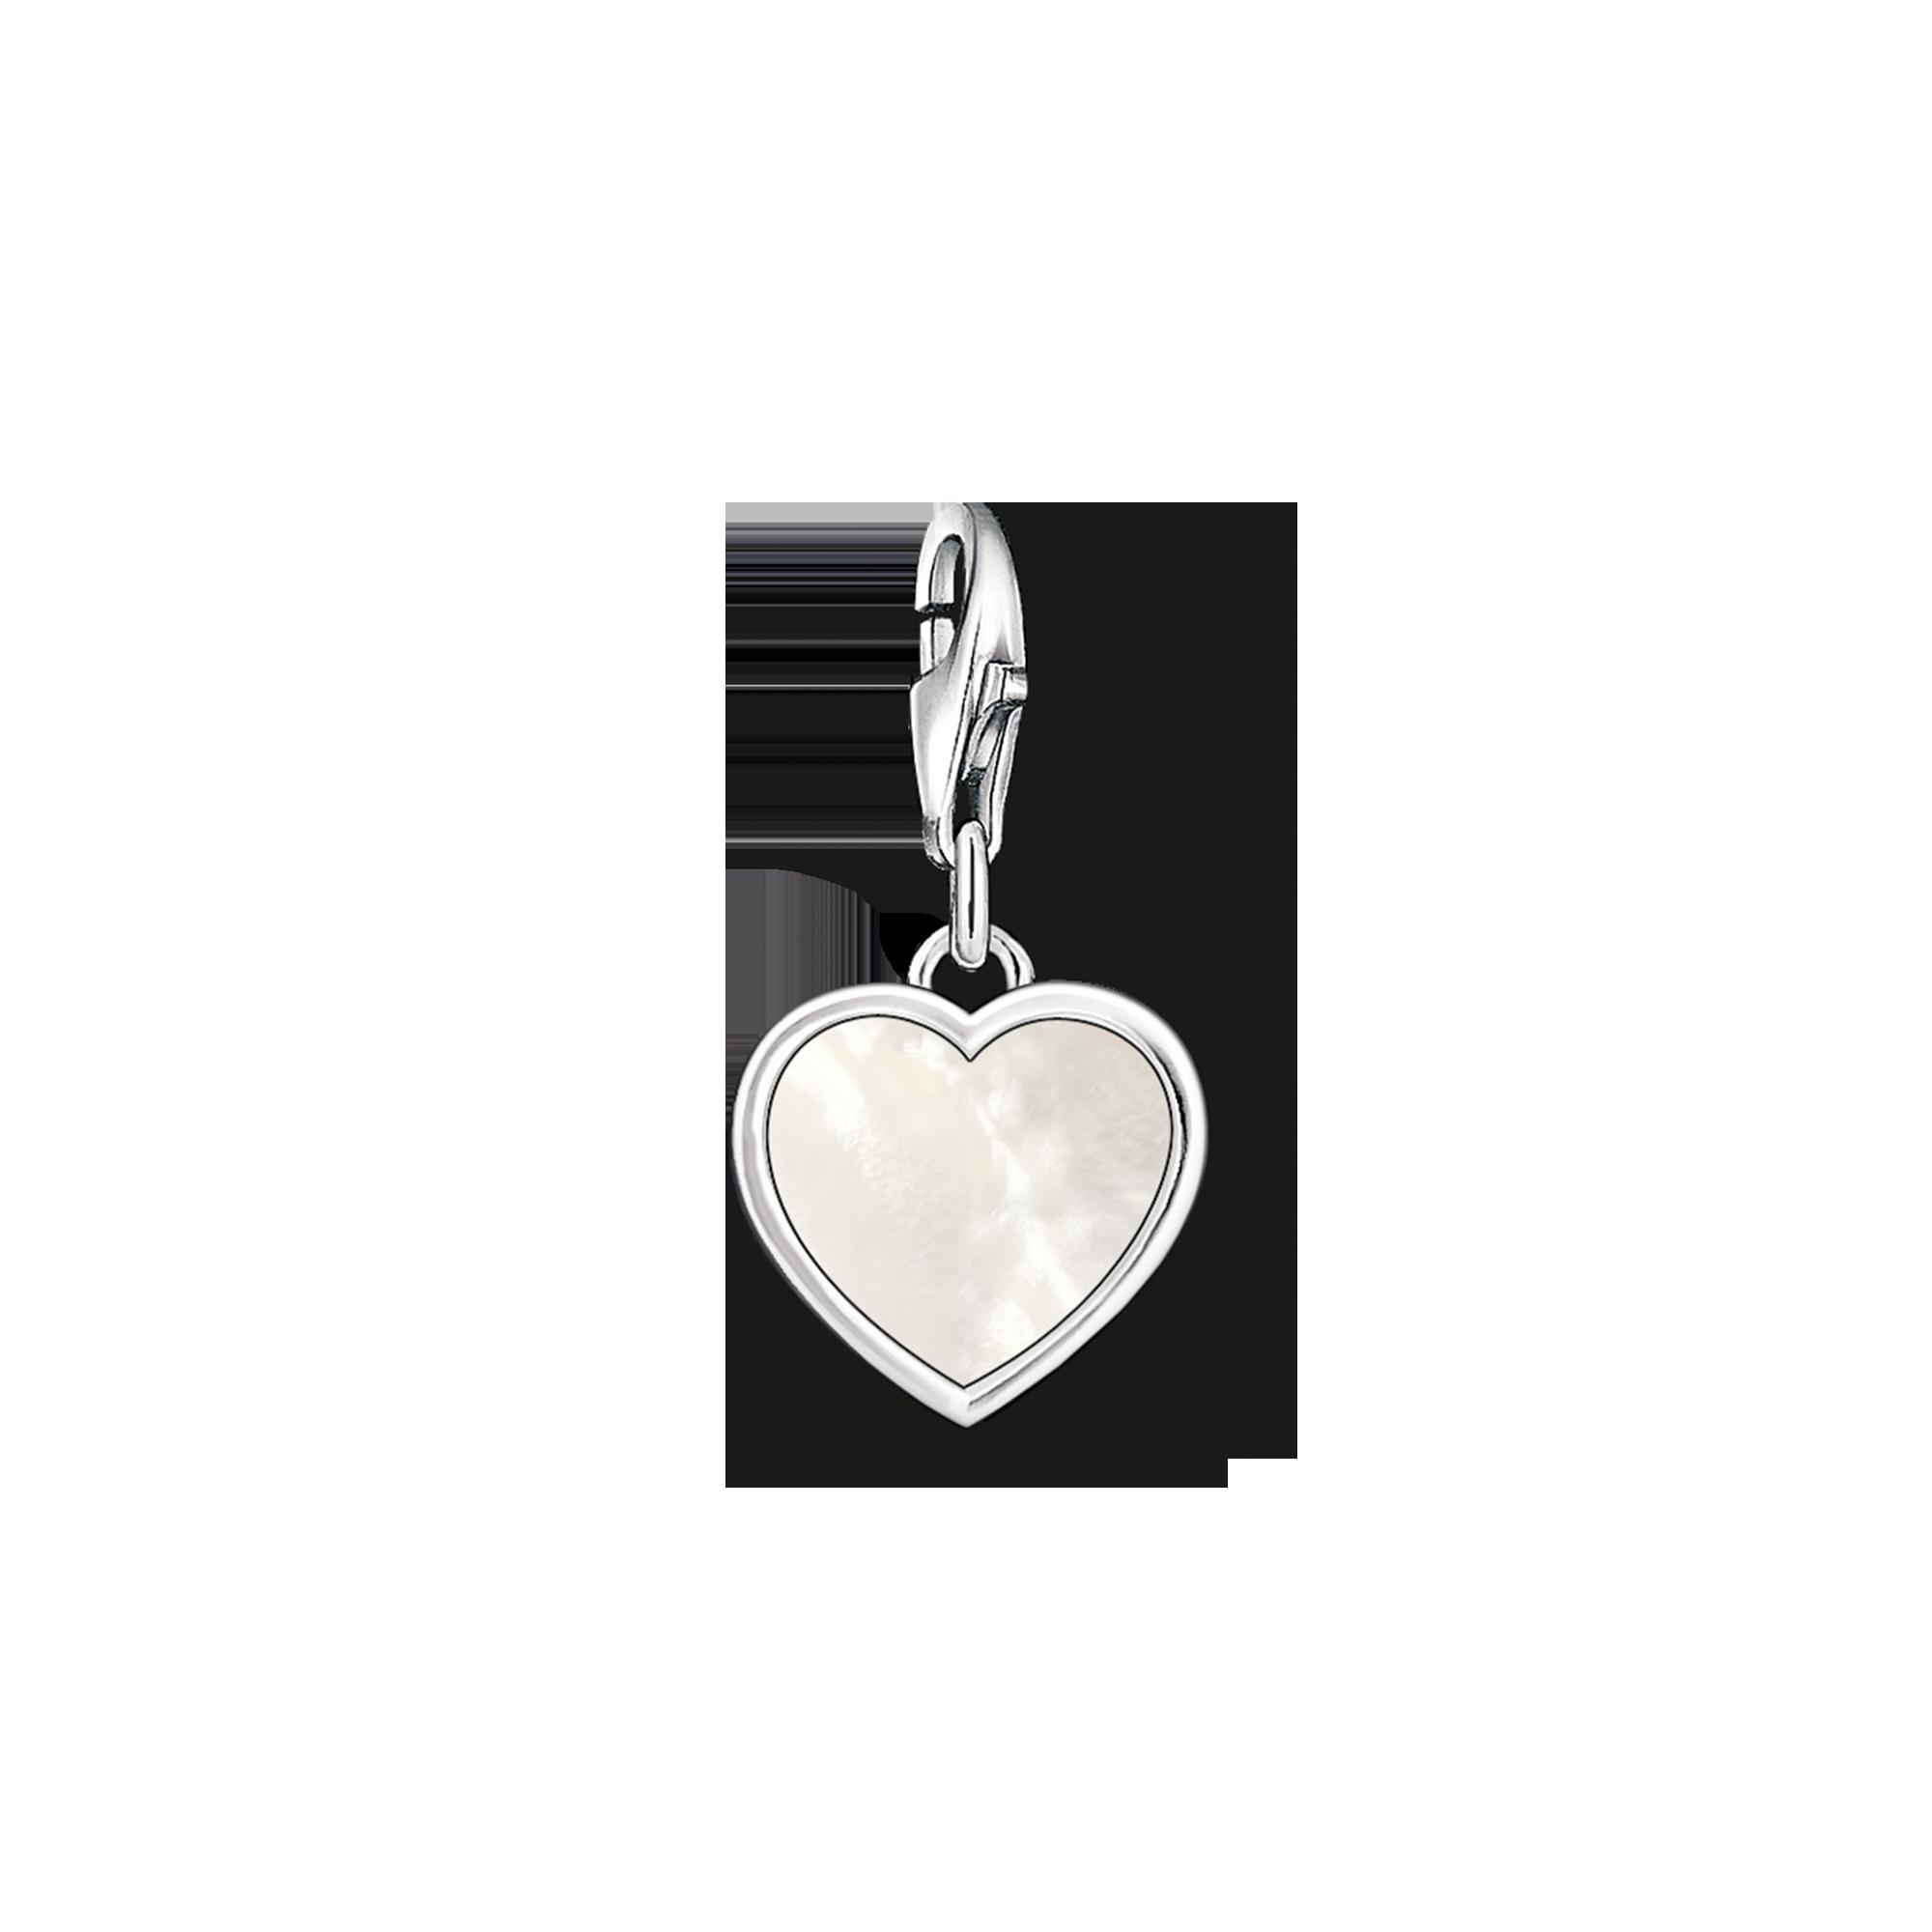 "Thomas Sabo - Charm pendant ""mother-of-pearl heart"" - 1"